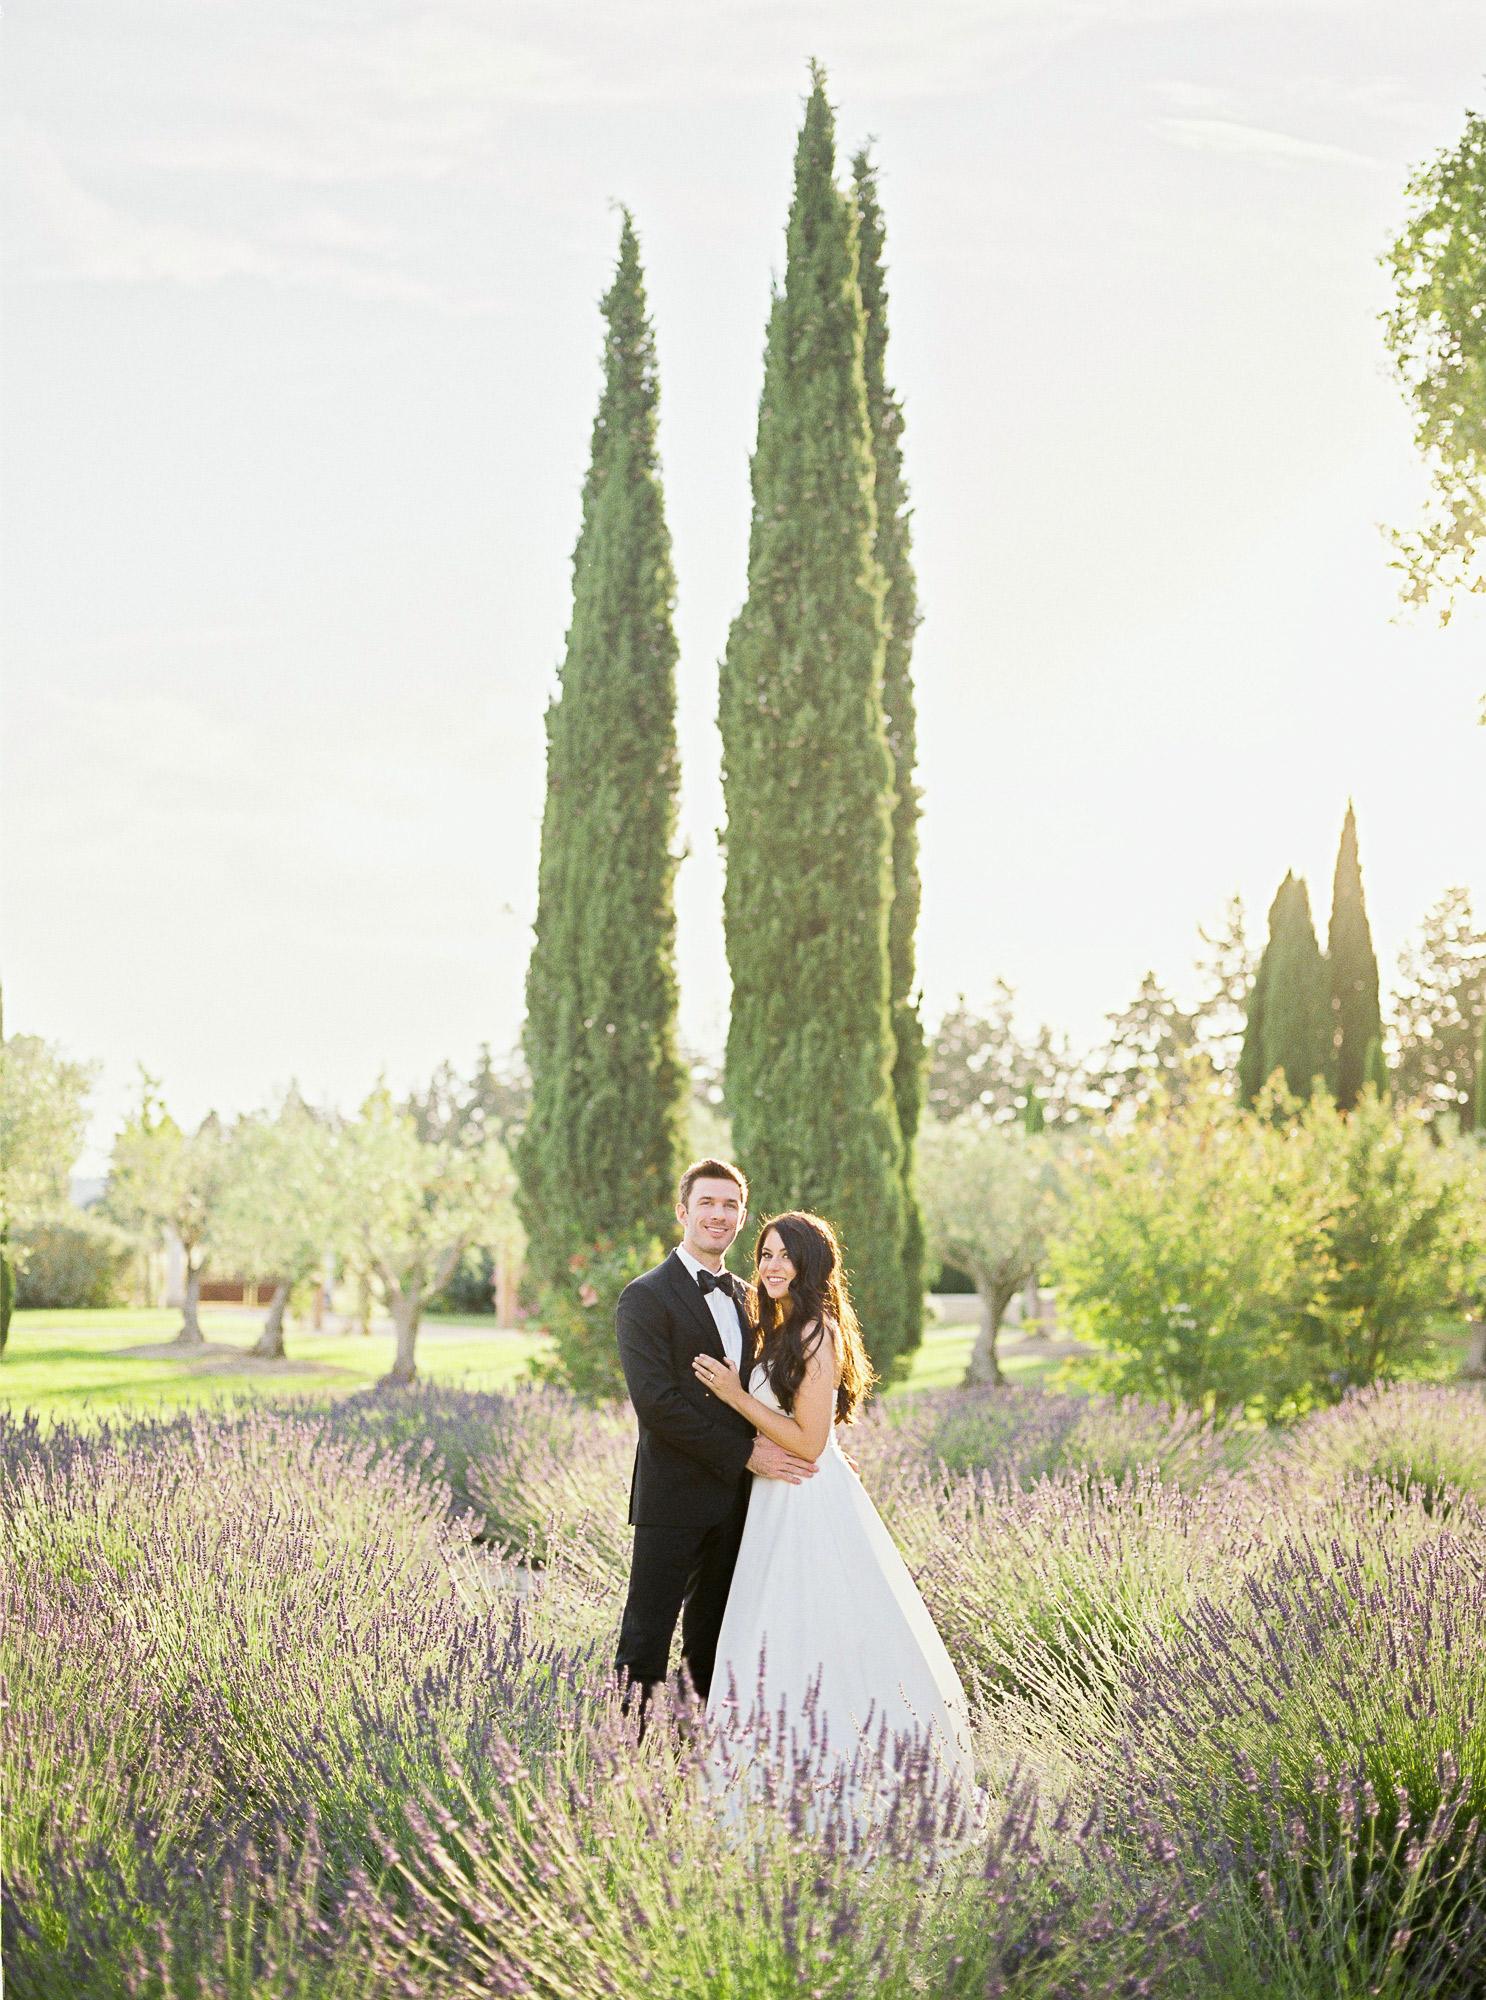 samantha grayson wedding couple embrace